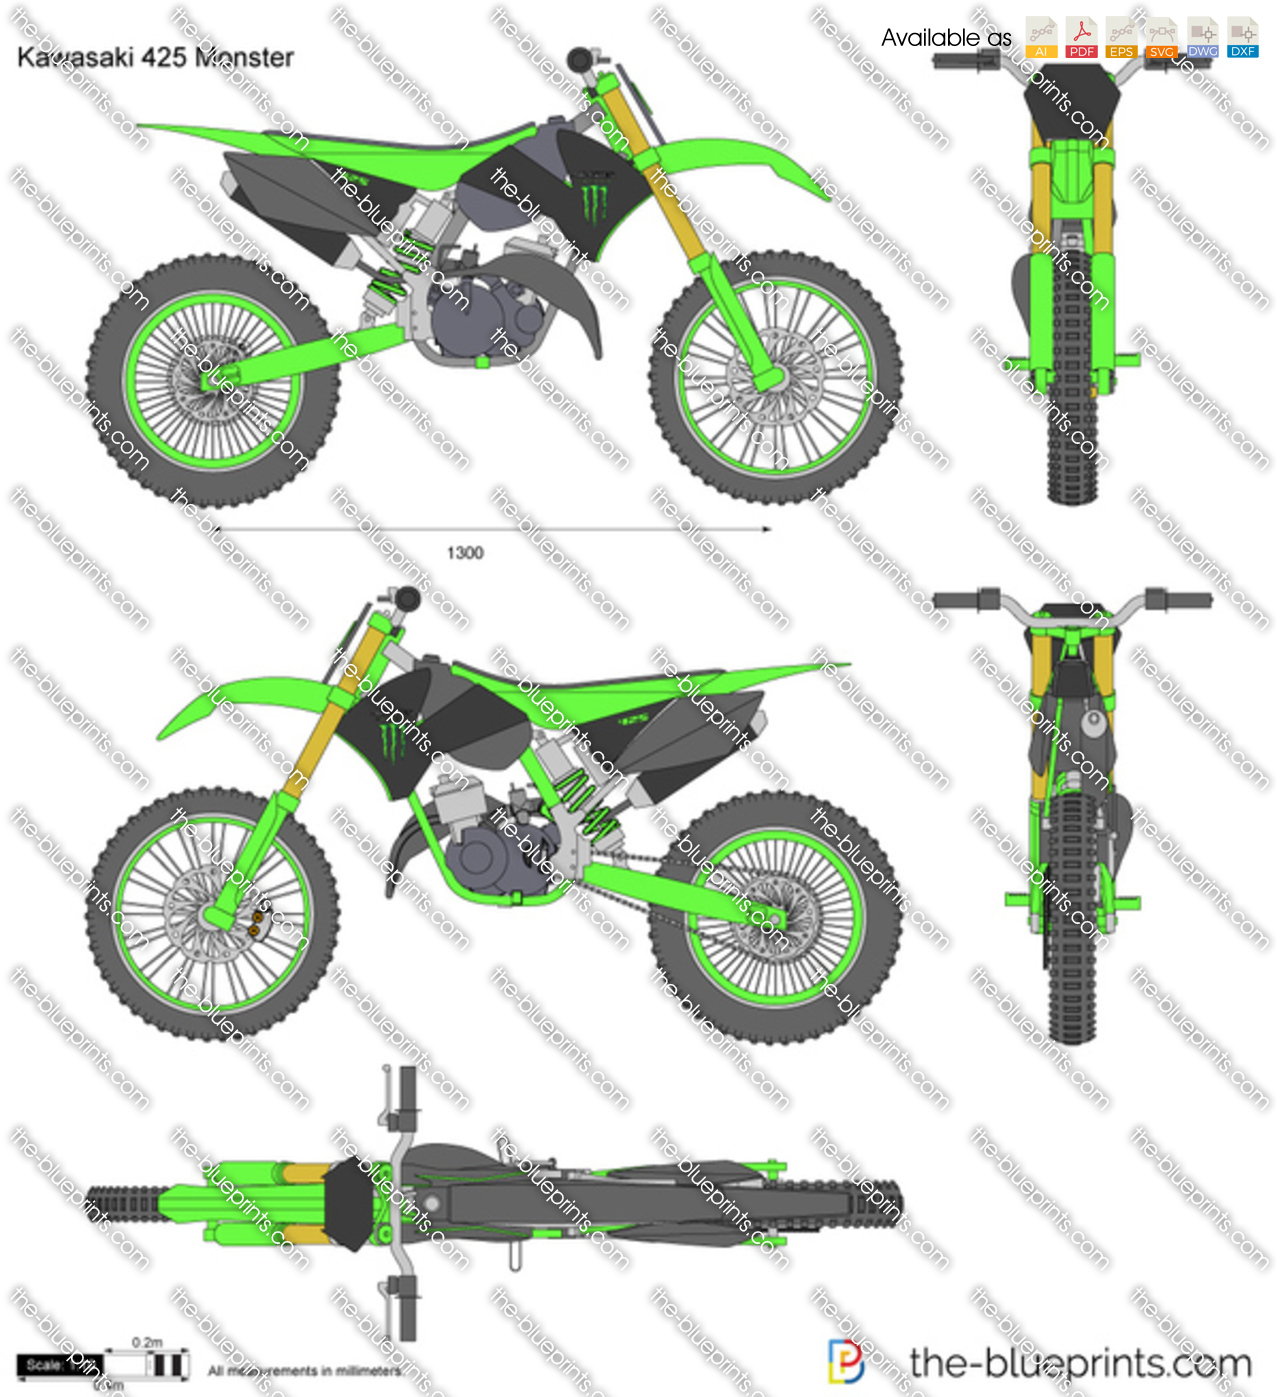 Kawasaki 425 Monster